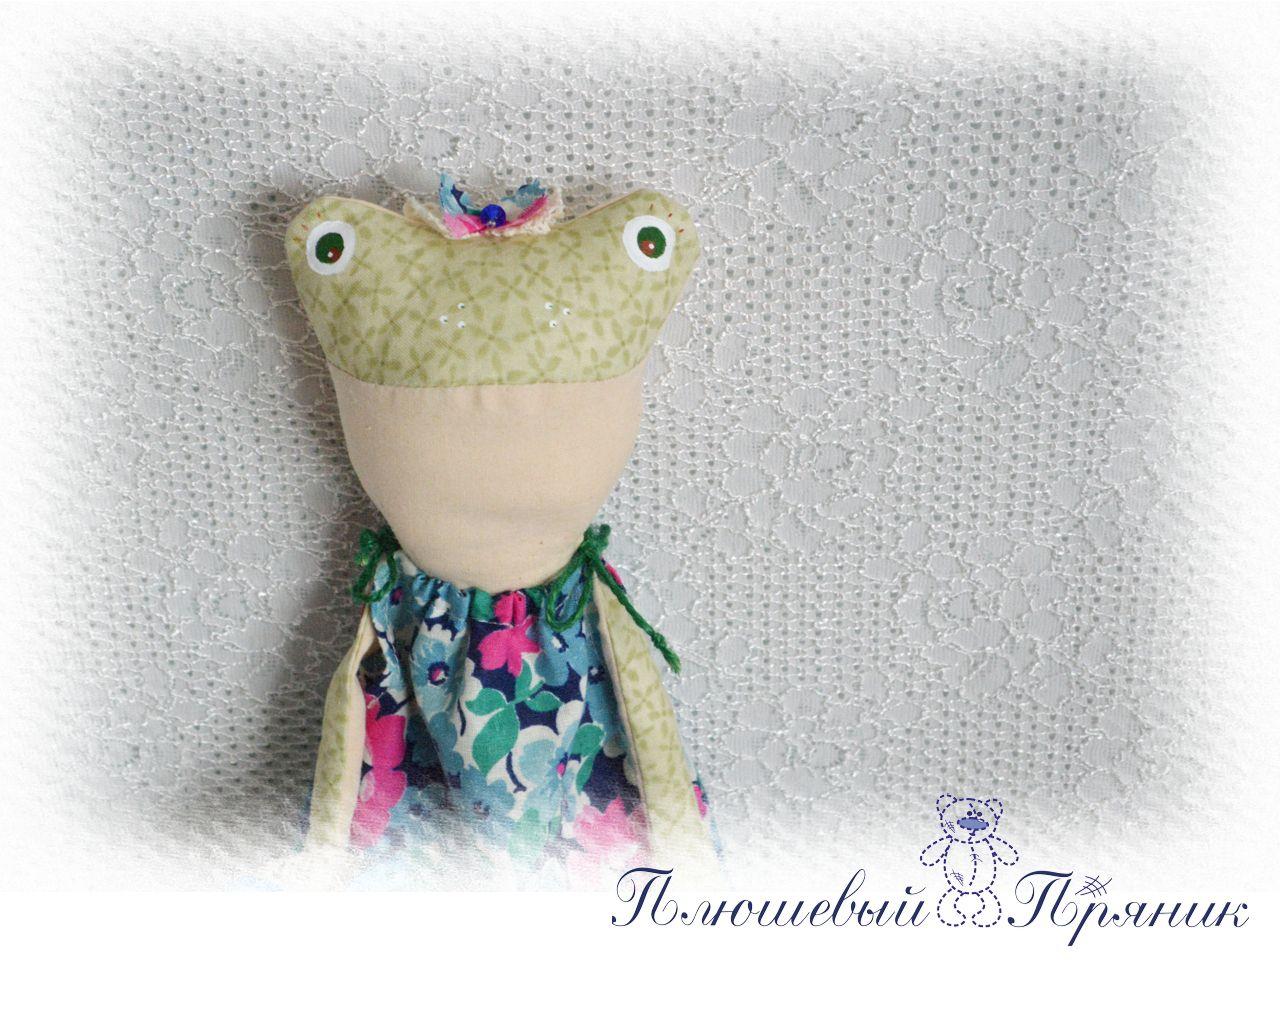 март подарок кукла квакушка весна коллекция лягушка